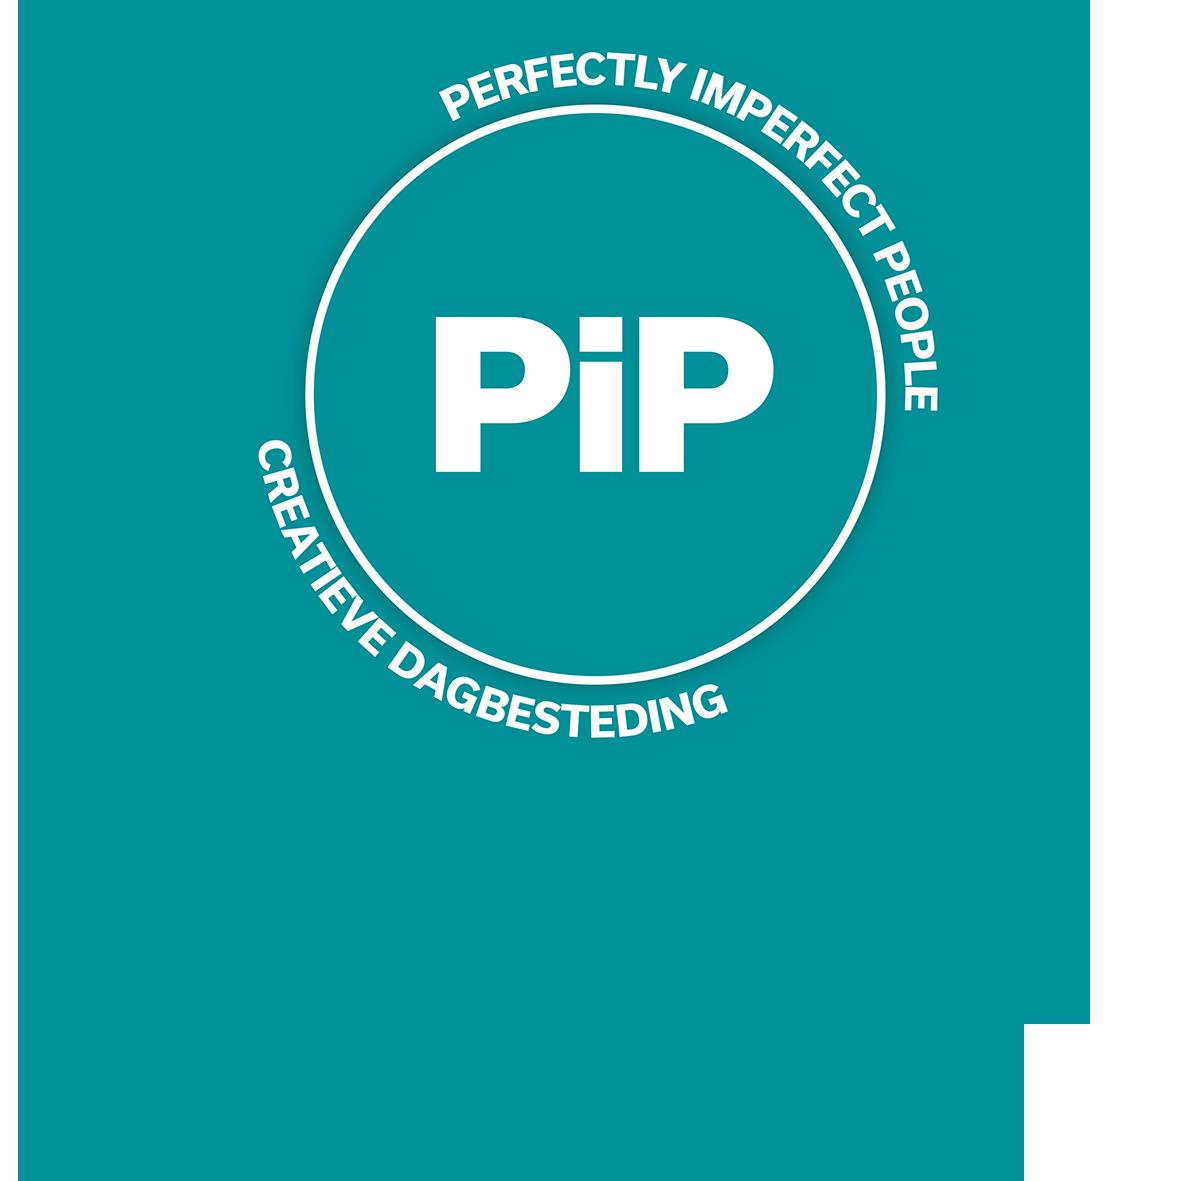 PiP dagbesteding